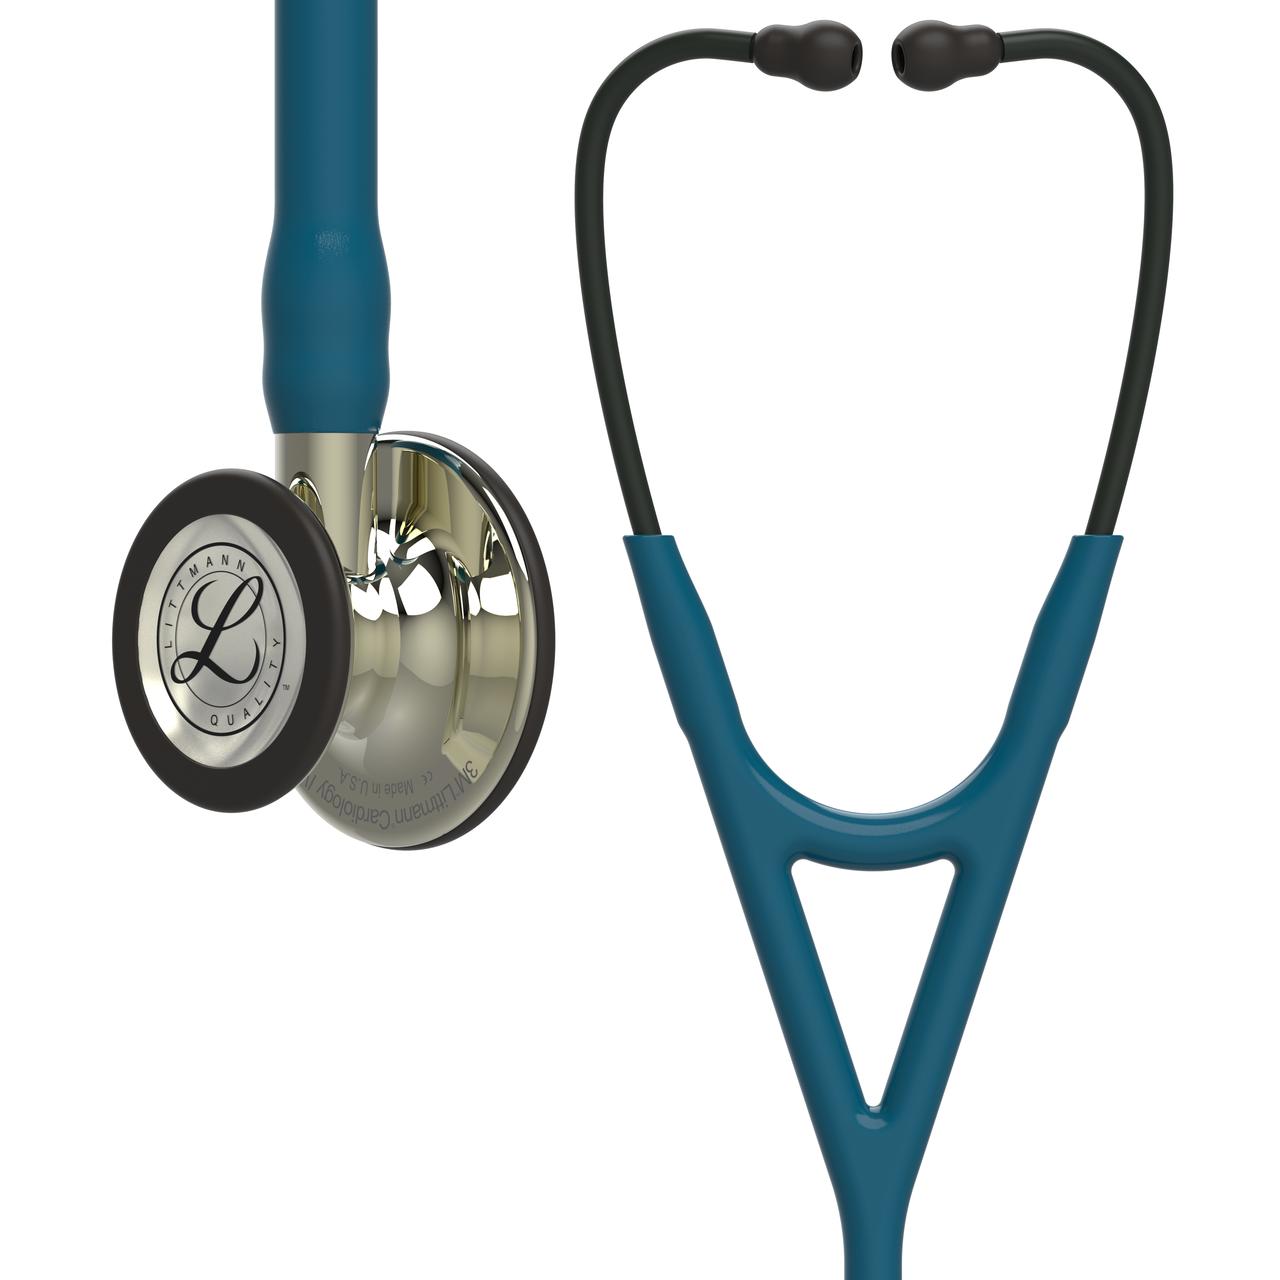 Littmann Cardiology IV Stethoscope, Champagne Caribbean, 6190